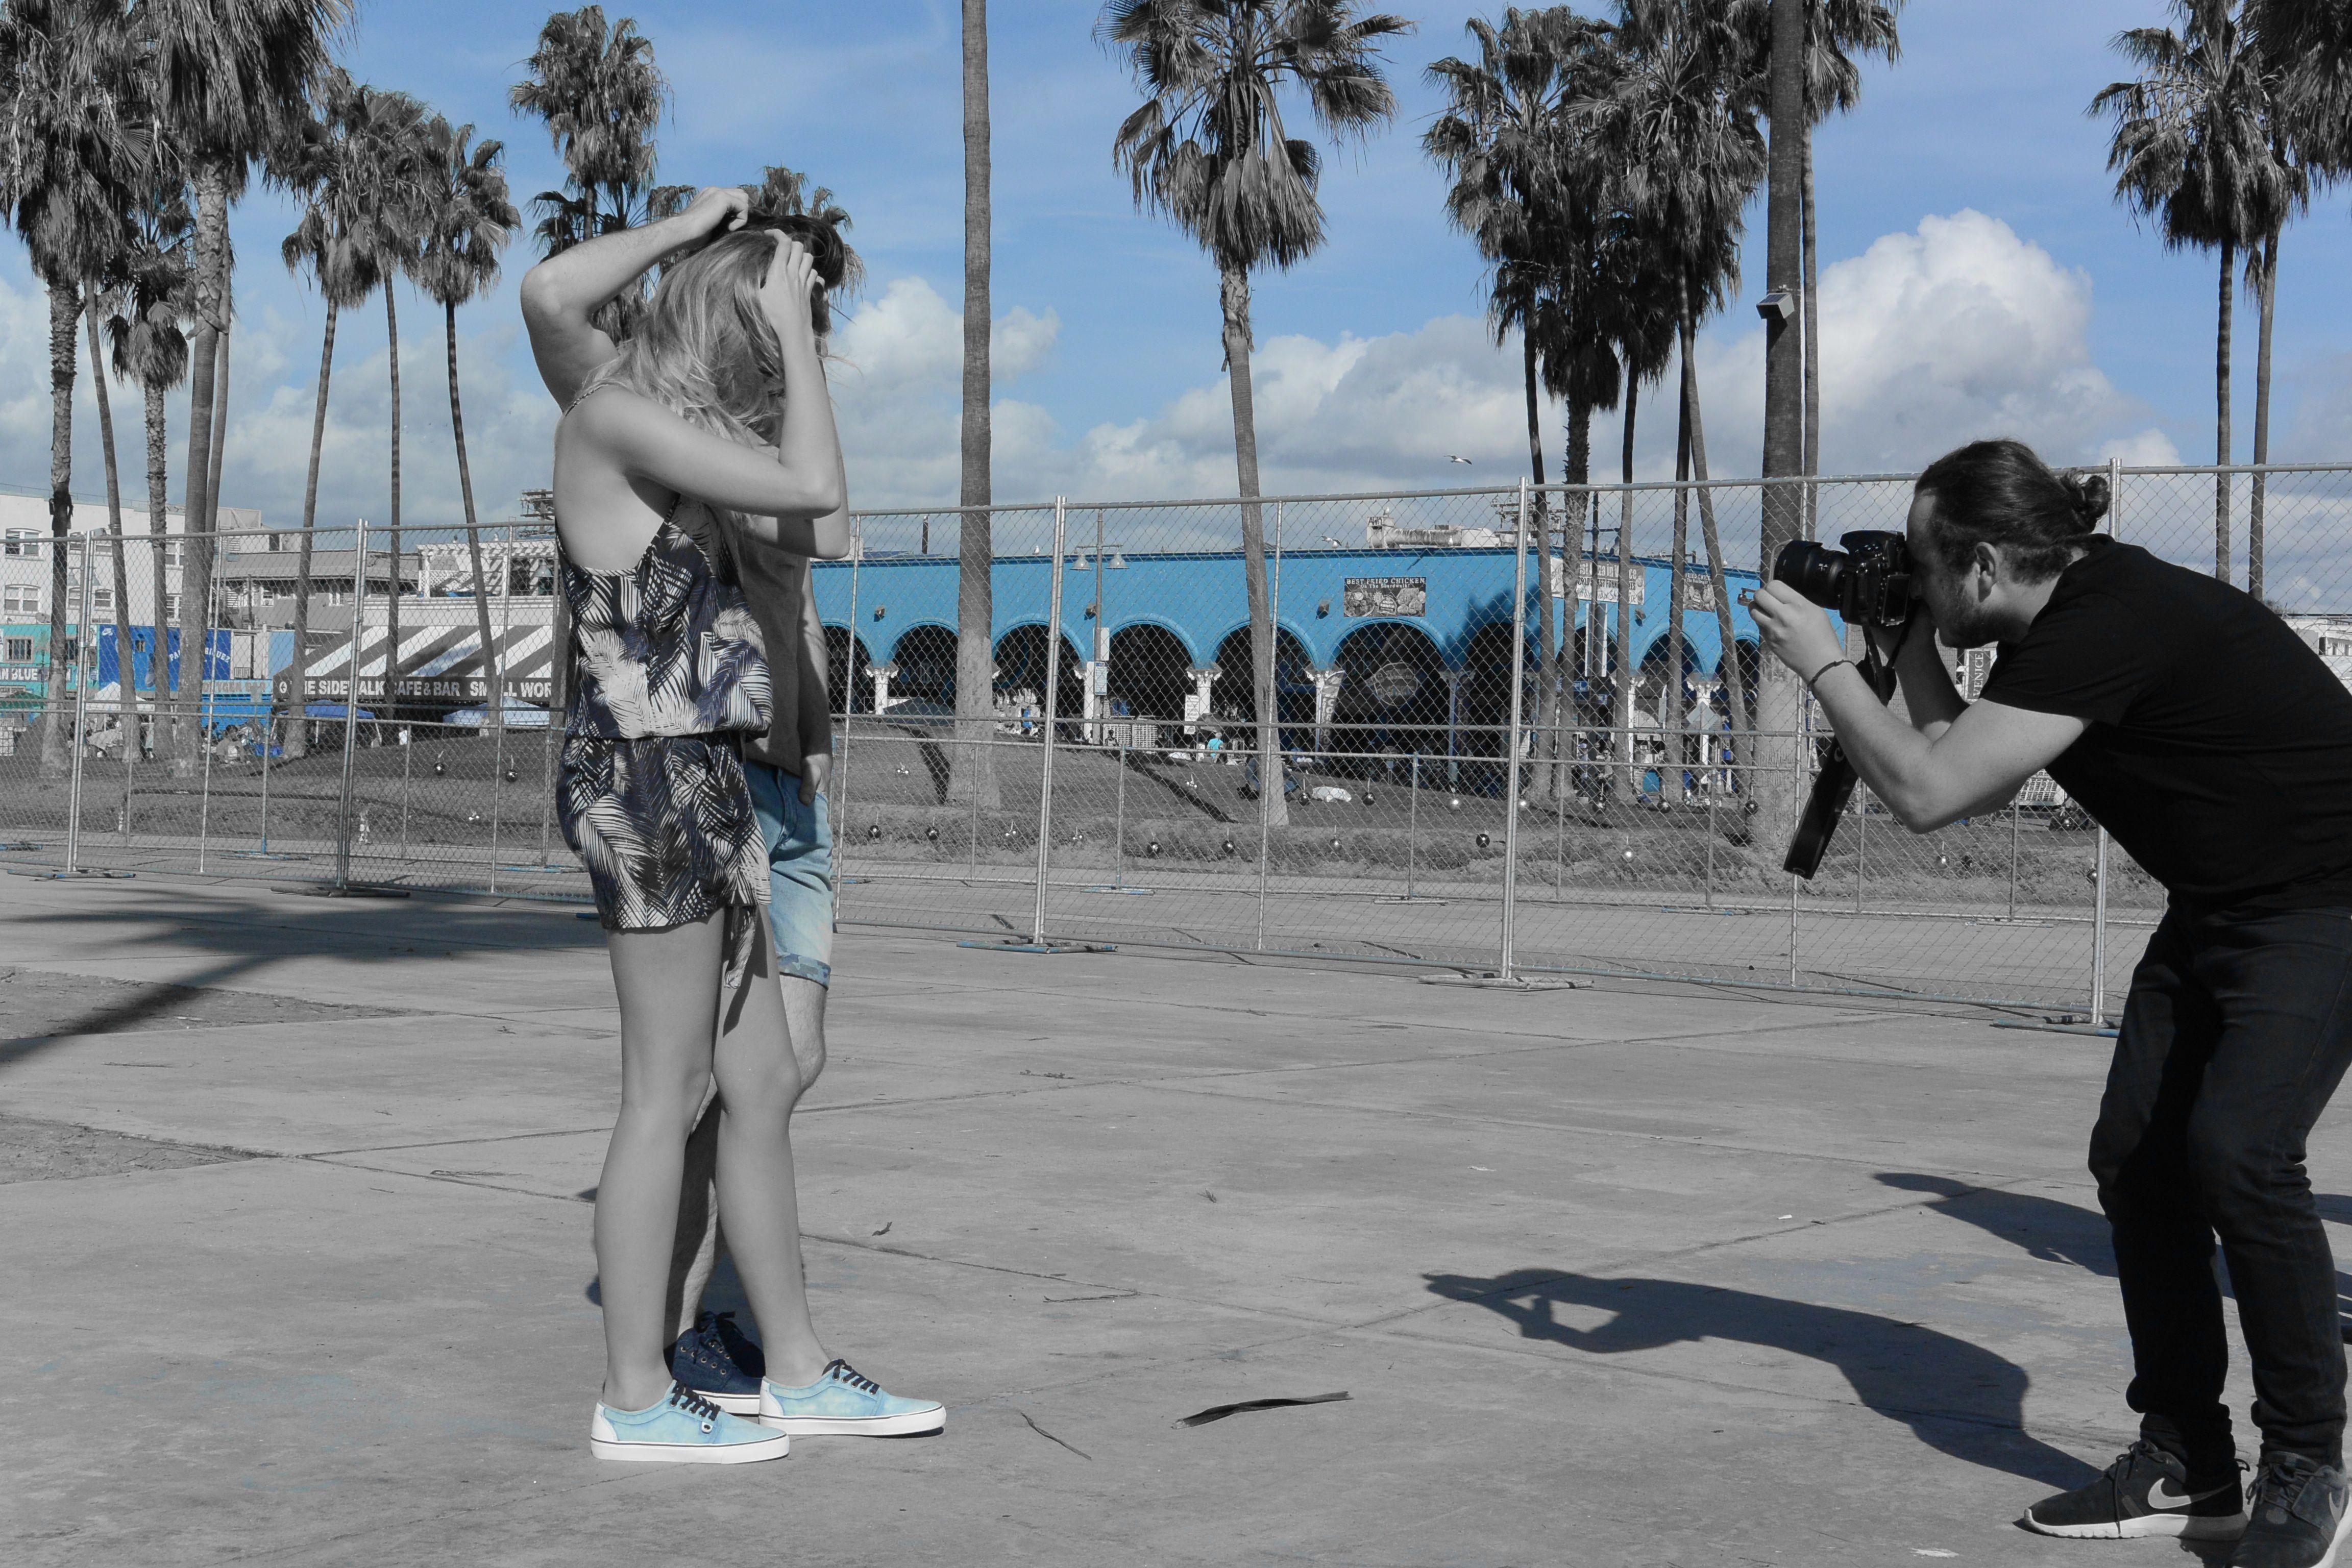 Kampania Diverse wiosna 2015 - Los Angeles.